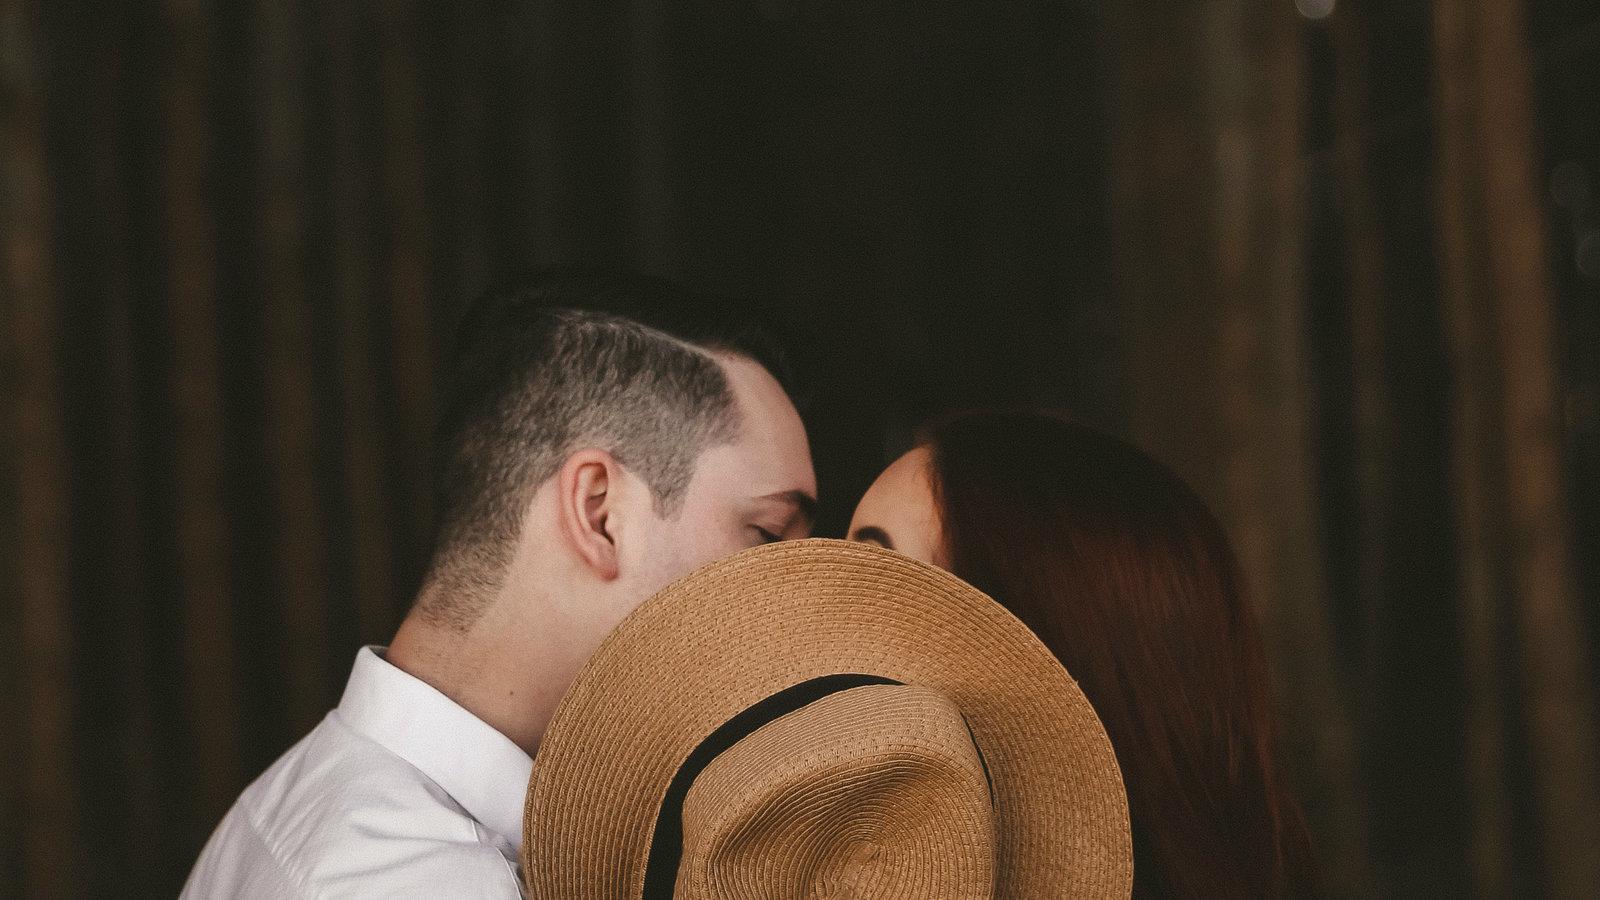 Dating an older man christian